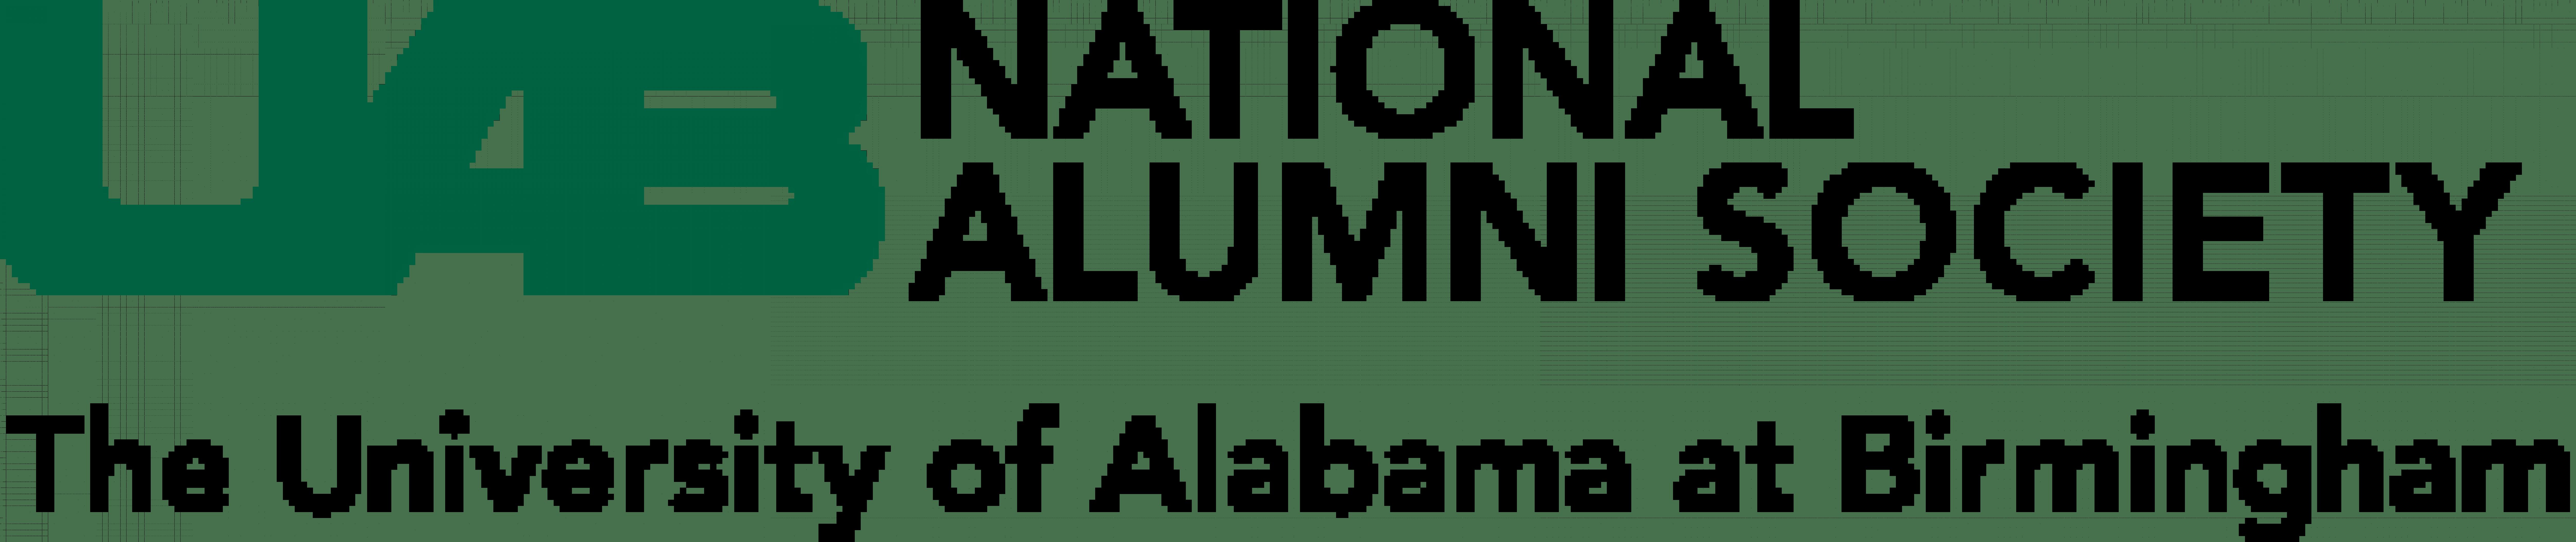 UAB National Alumni Society logo